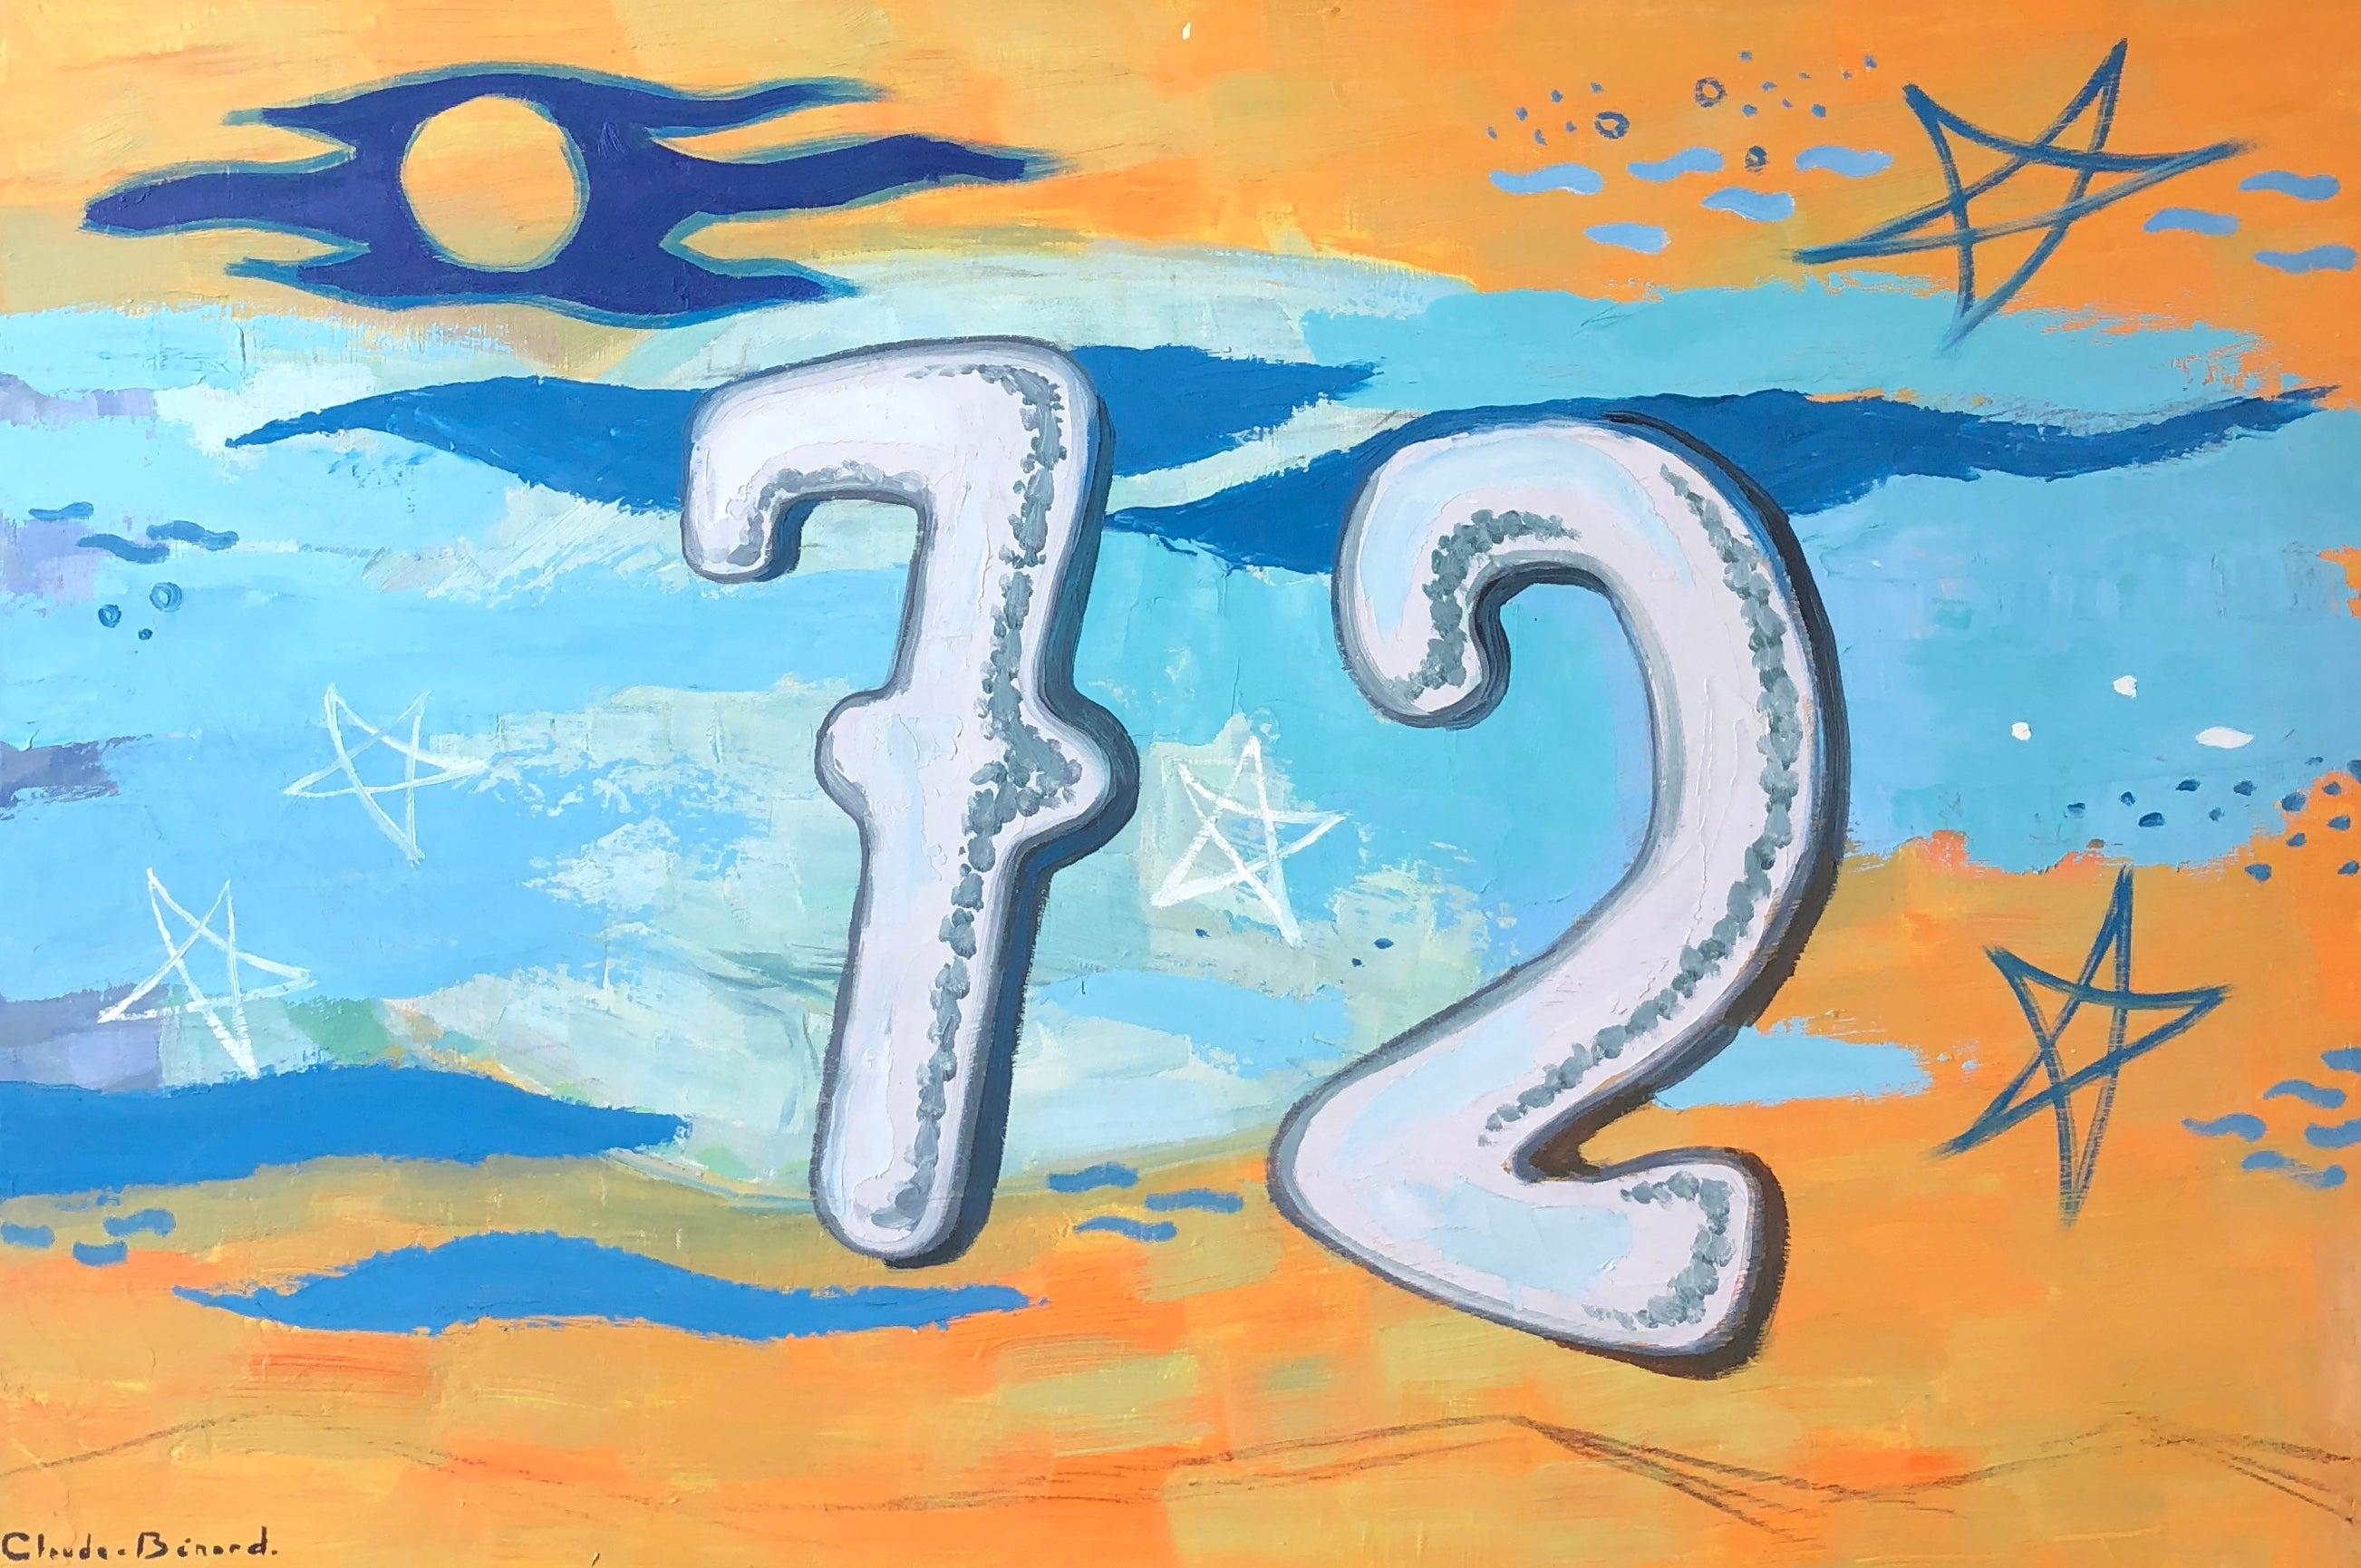 '72', Still Life Signed Oil Painting